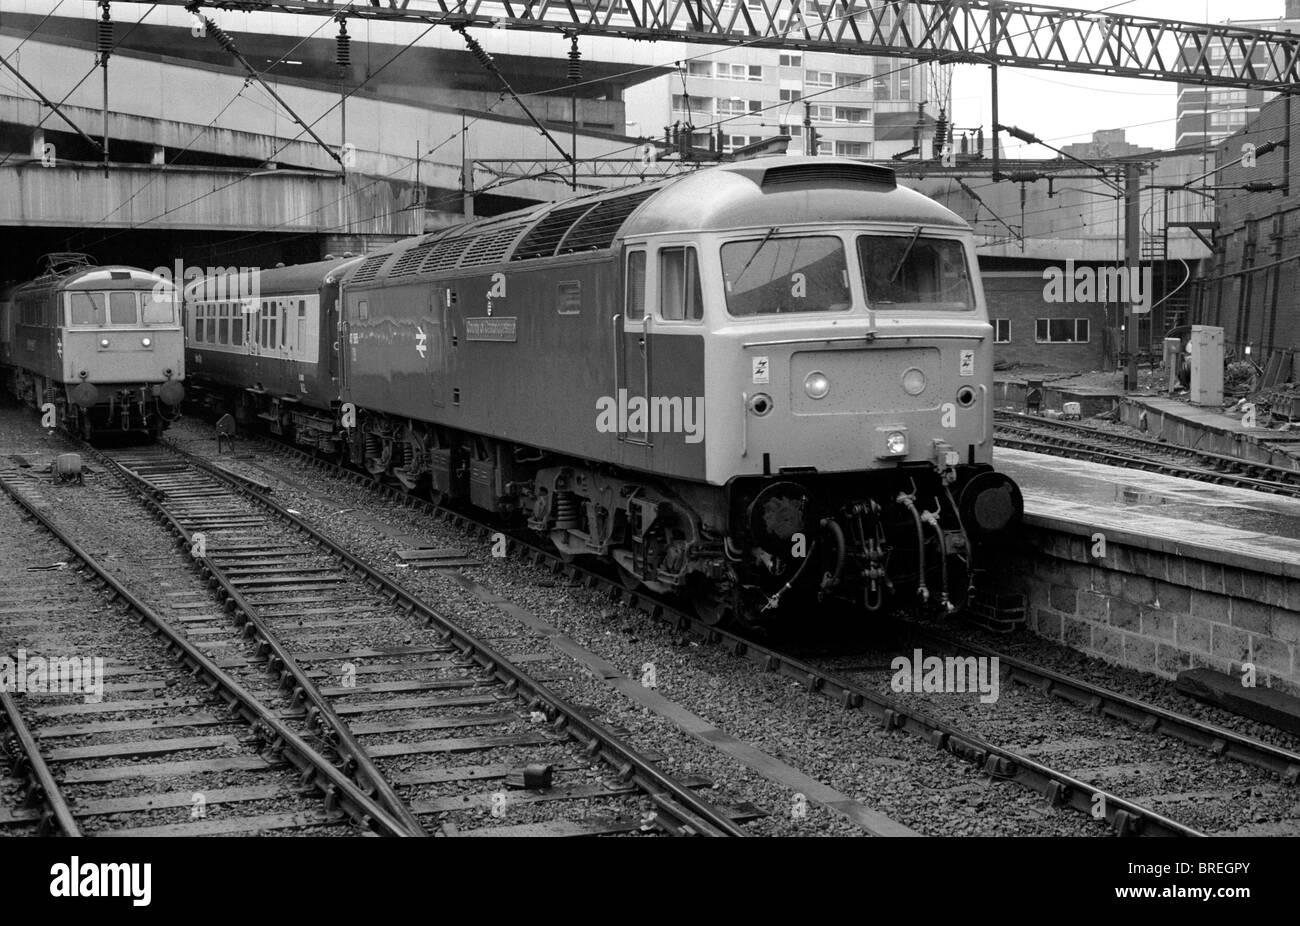 Trains at Birmingham New Street railway station 1985 - Stock Image